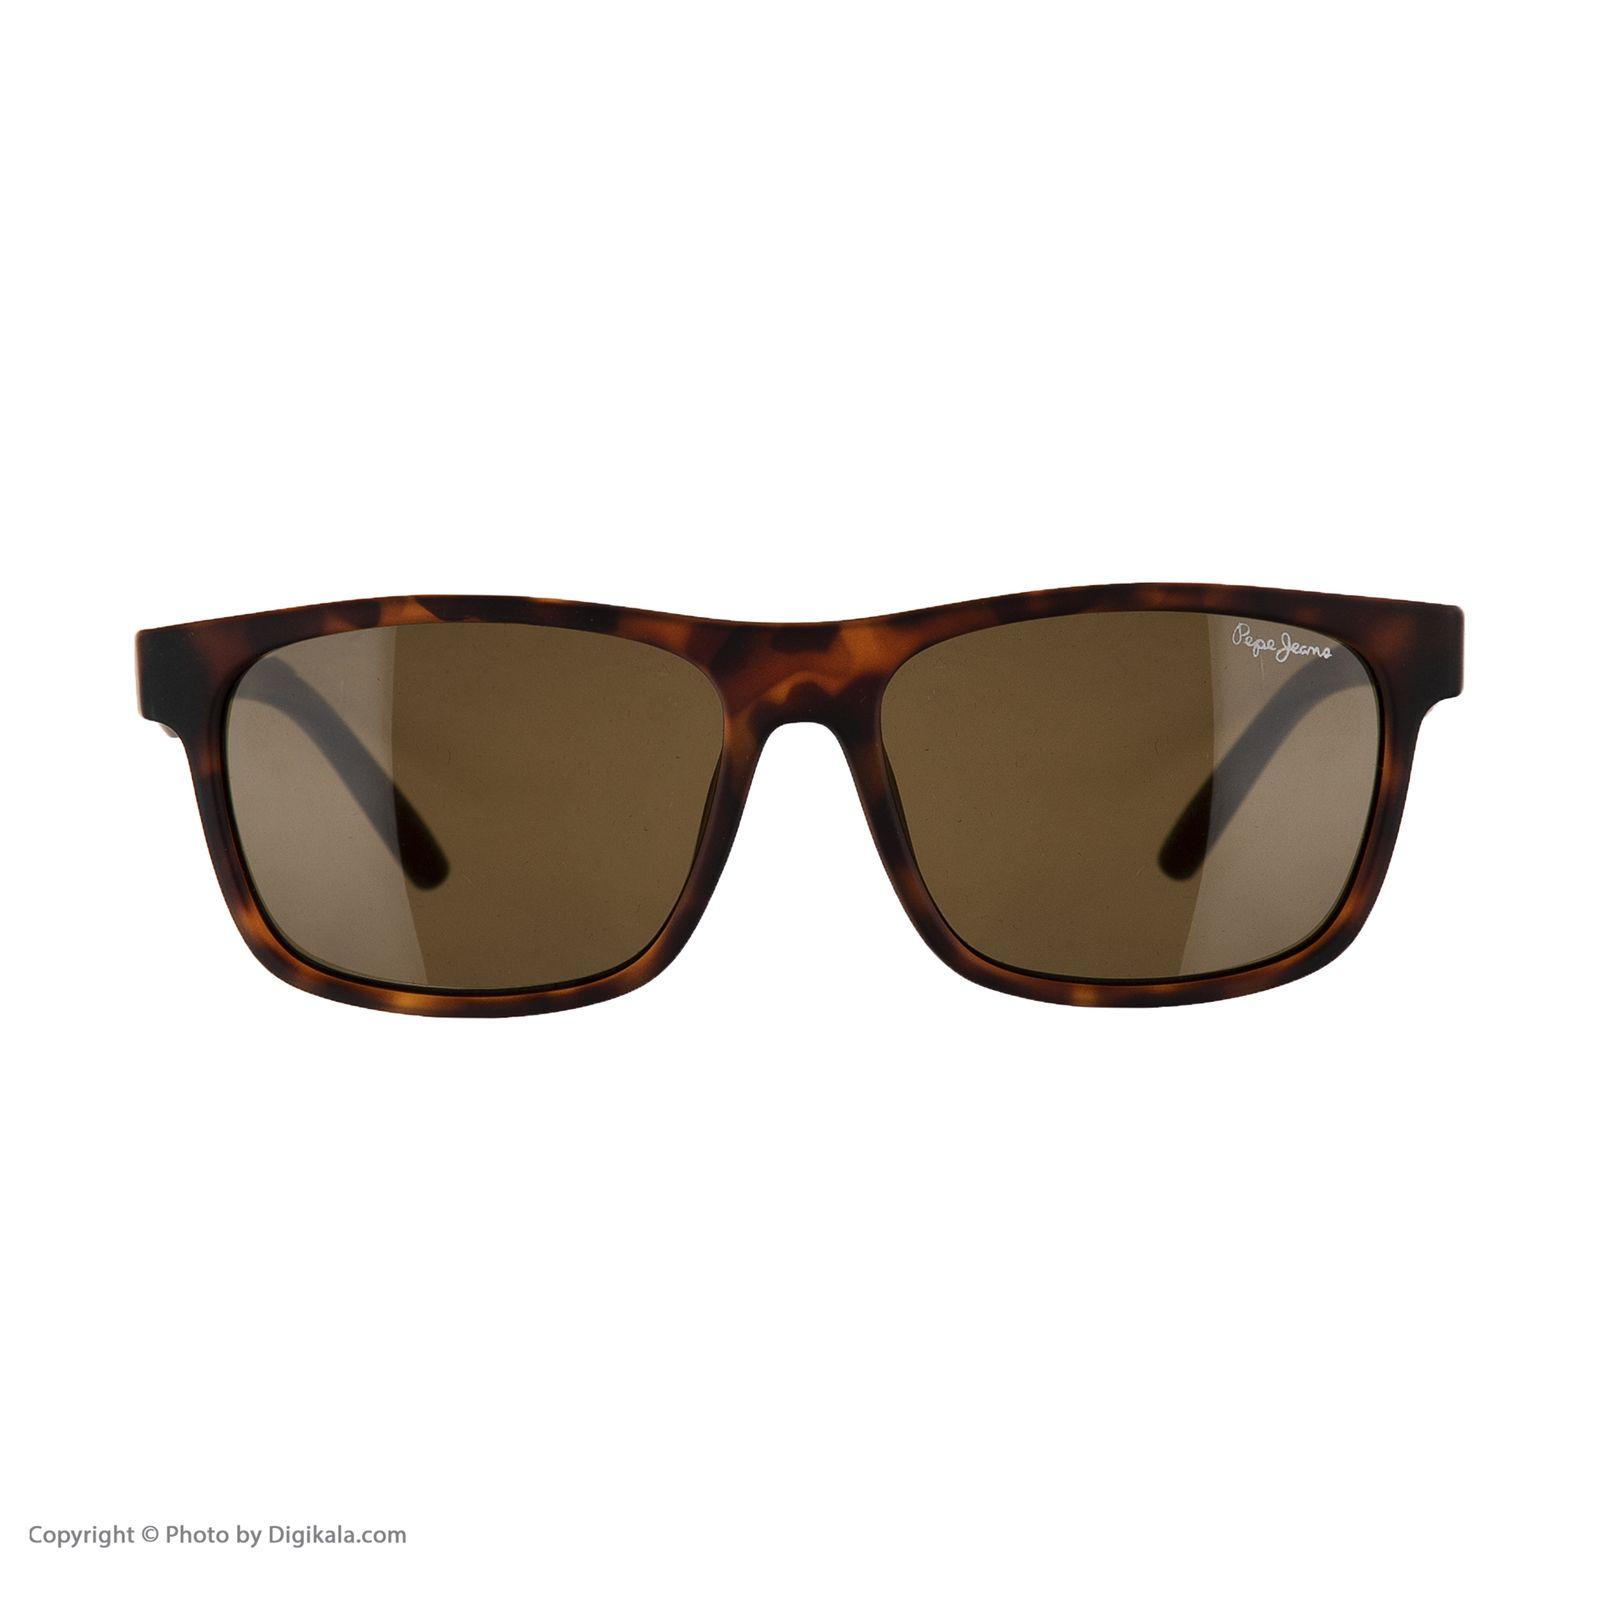 عینک آفتابی زنانه پپه جینز مدل PJ 8039 C2 -  - 1